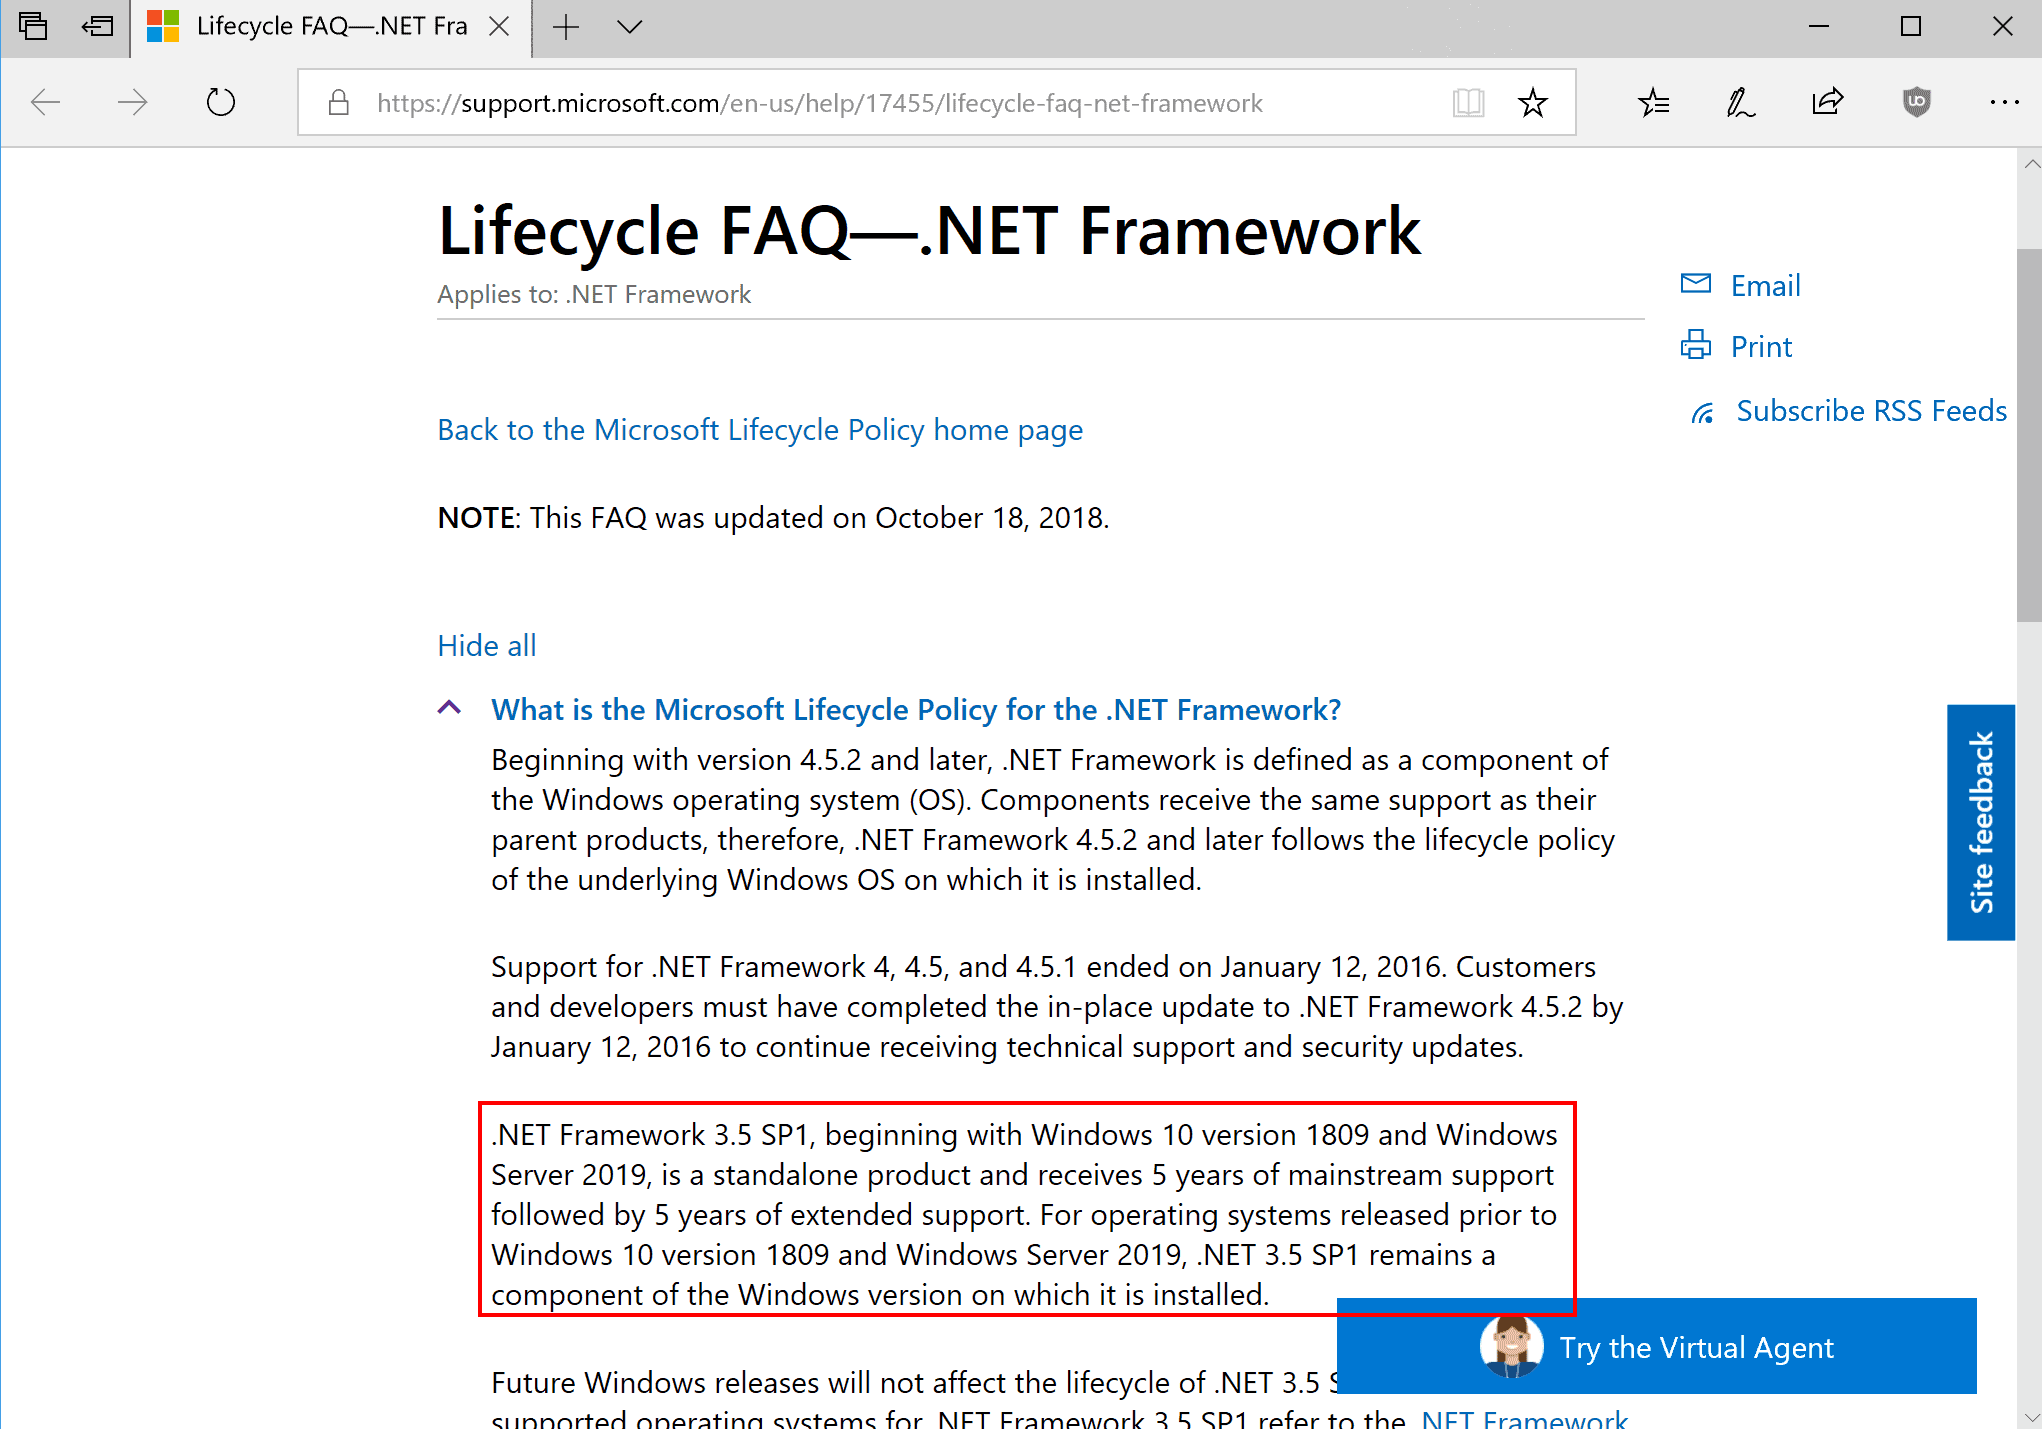 windows 10 net framework 3.5 end of support